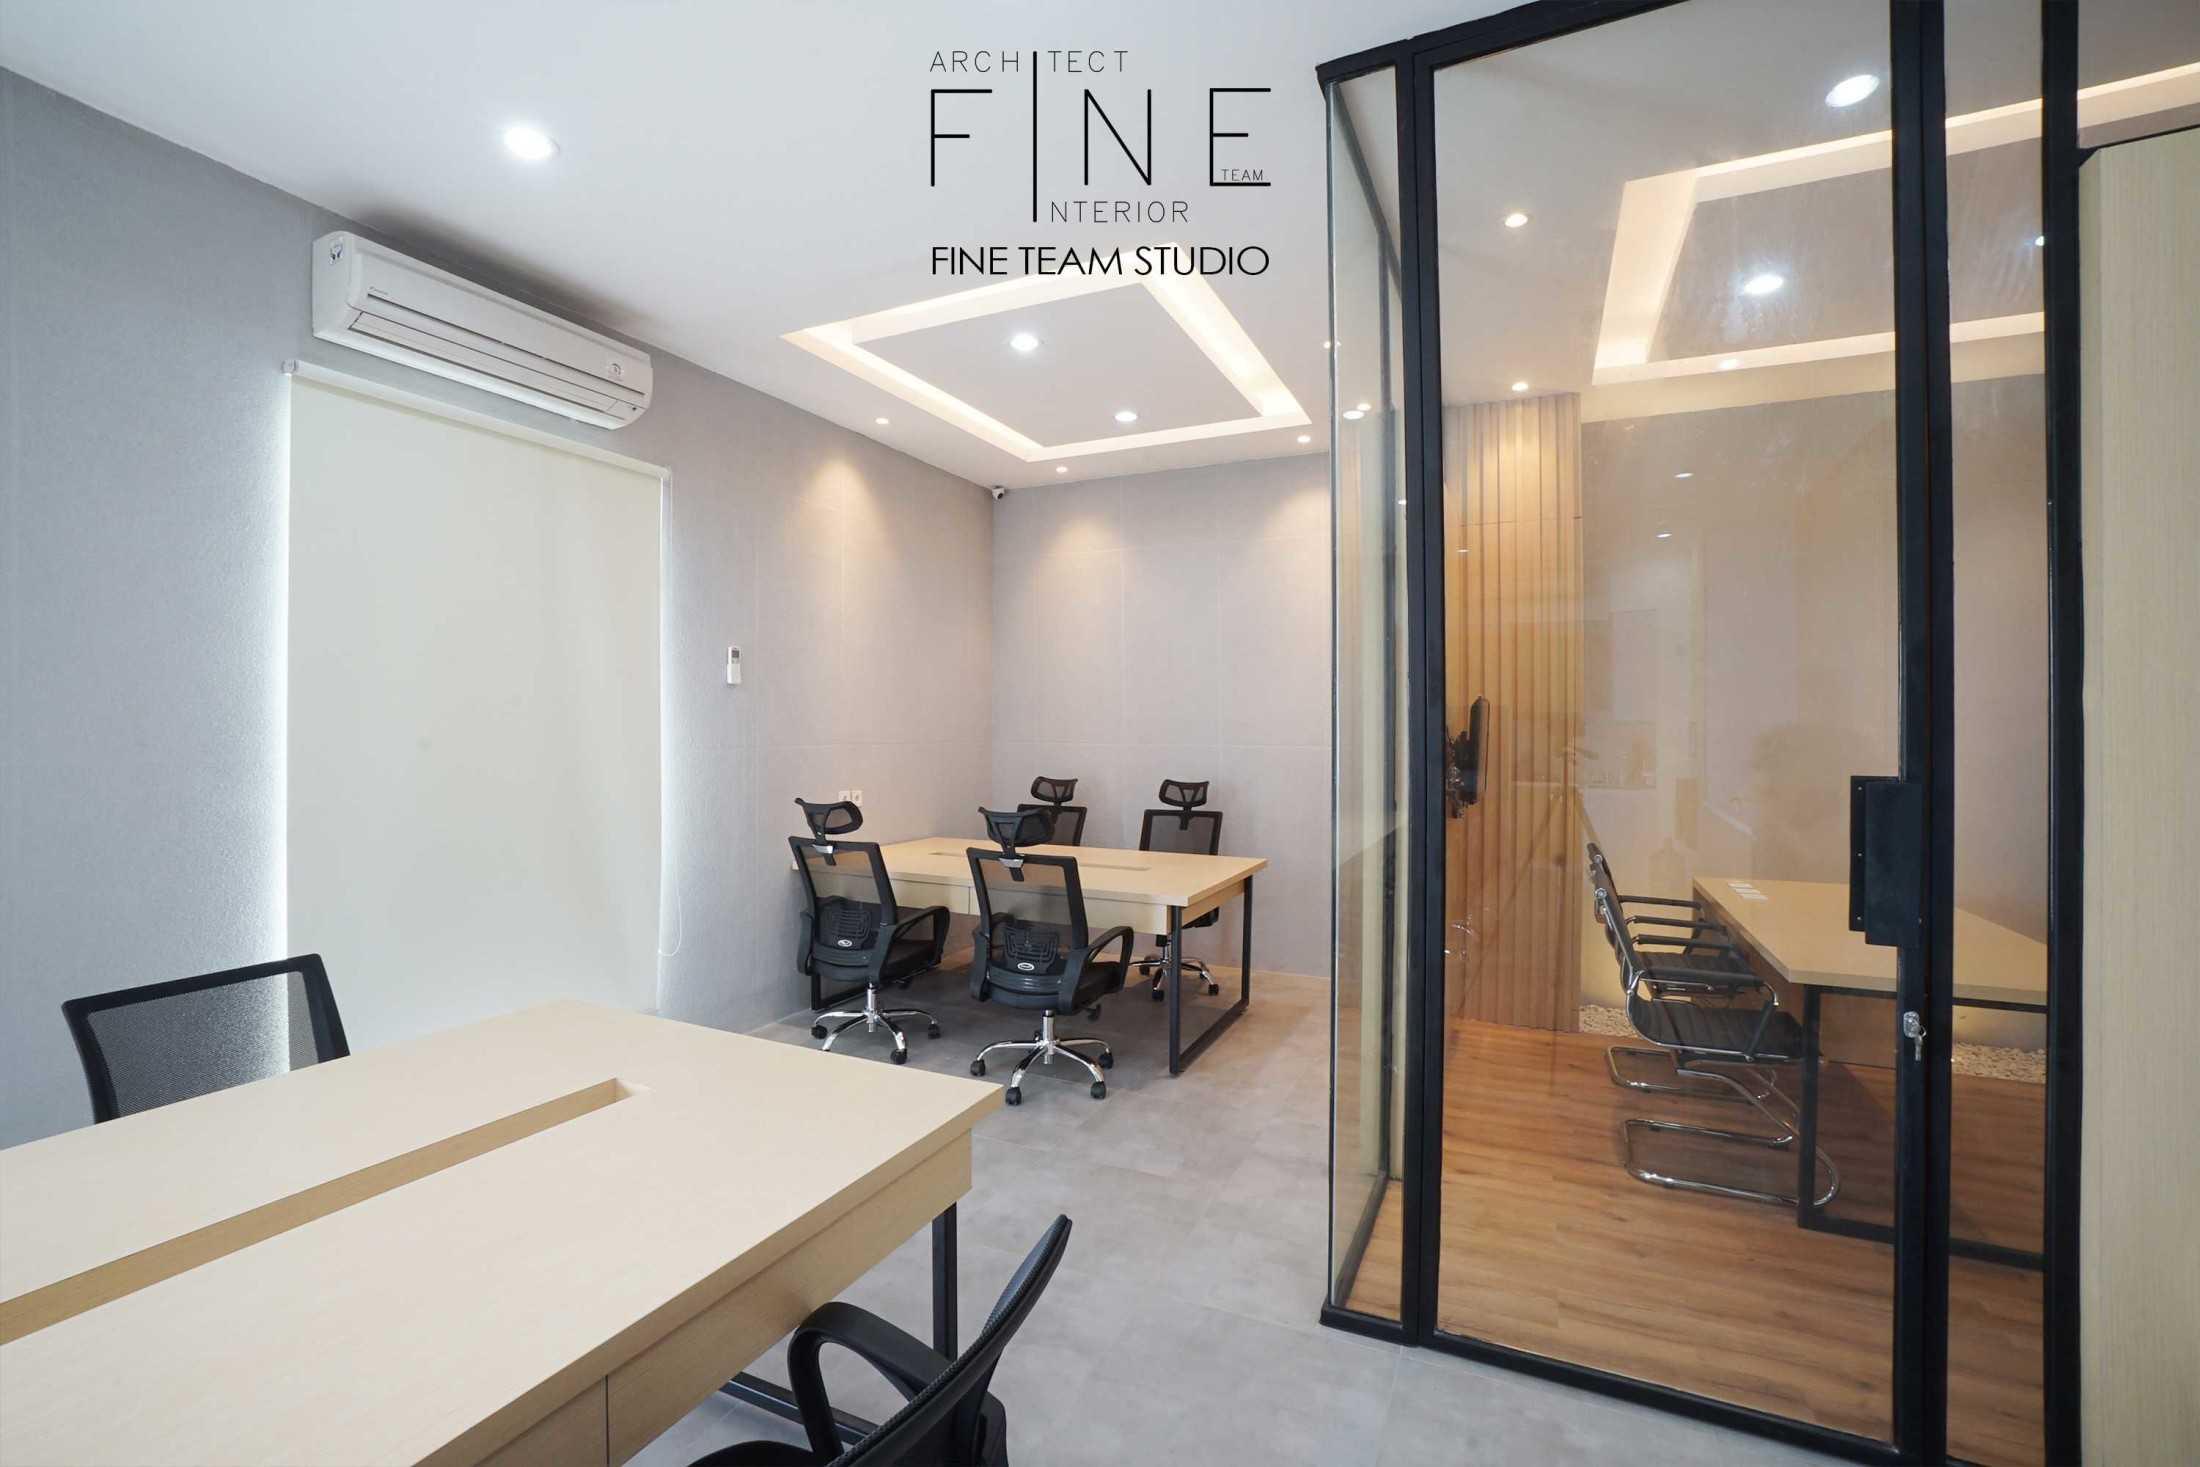 Fine Team Studio Mob Office Cikupa, Tangerang, Banten, Indonesia Cikupa, Tangerang, Banten, Indonesia Fine-Team-Studio-Mob-Office  71120